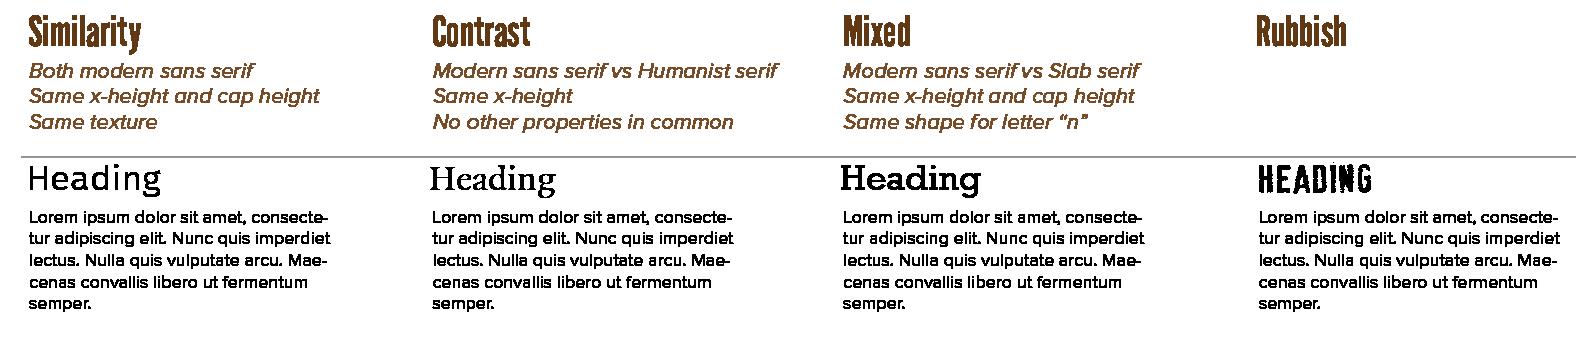 TypographyTypefacesSimilarityContrast